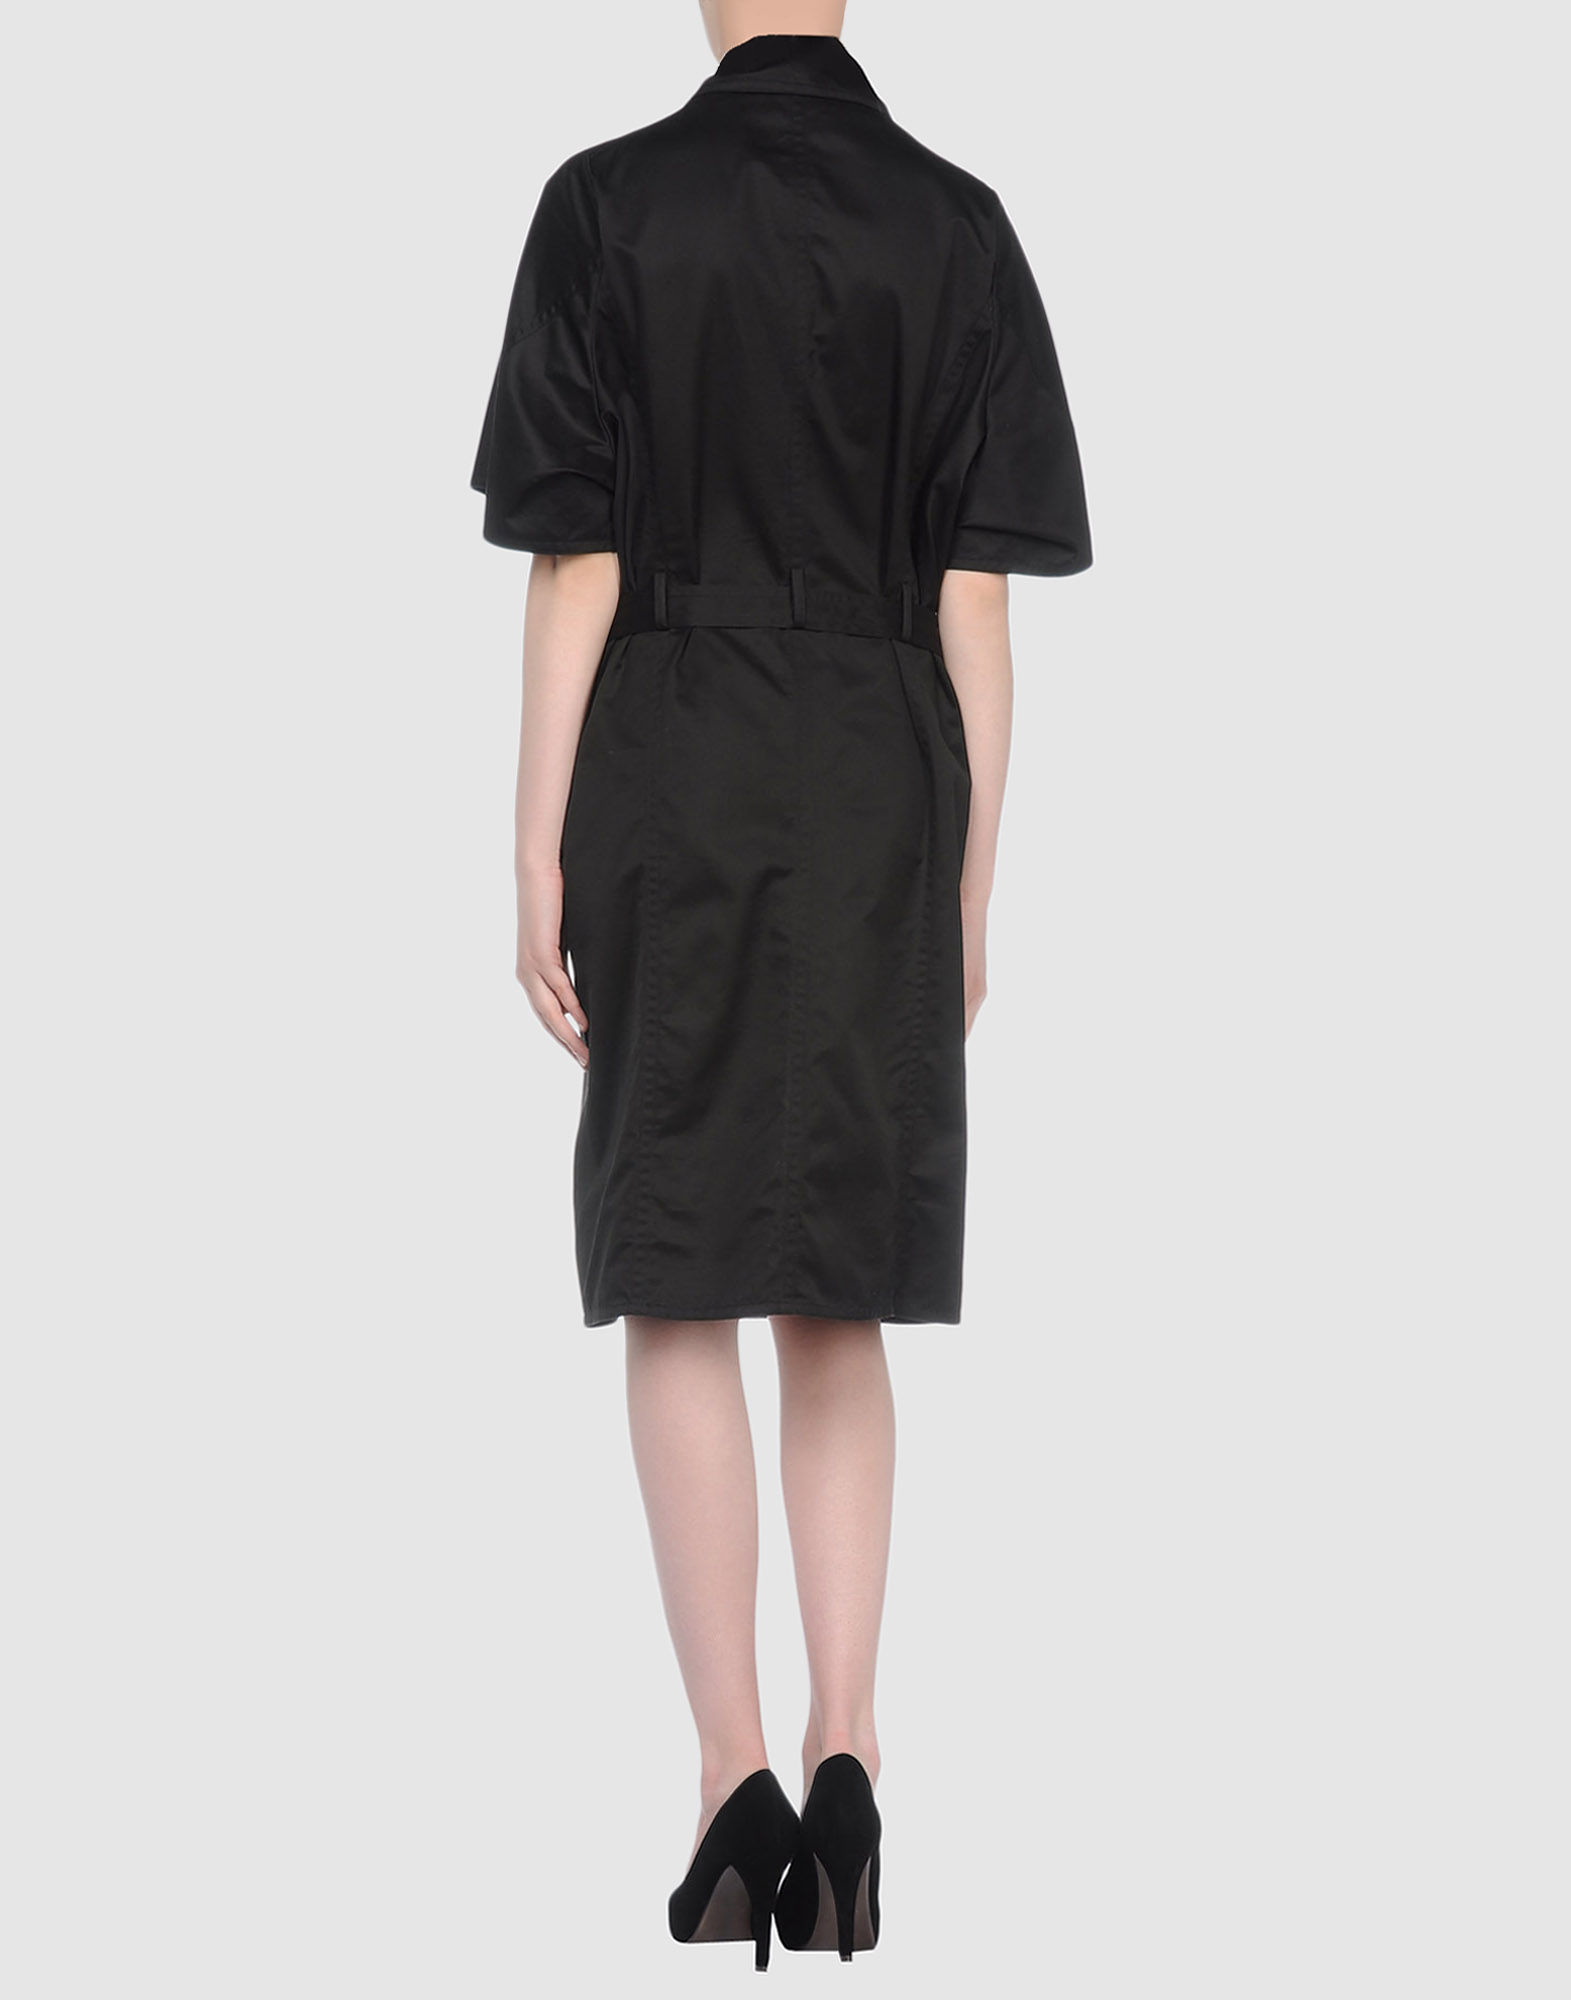 34219971FQ 14 r - Βραδυνα Φορεματα Yves Saint Laurent Rive Gauche Κωδ.06